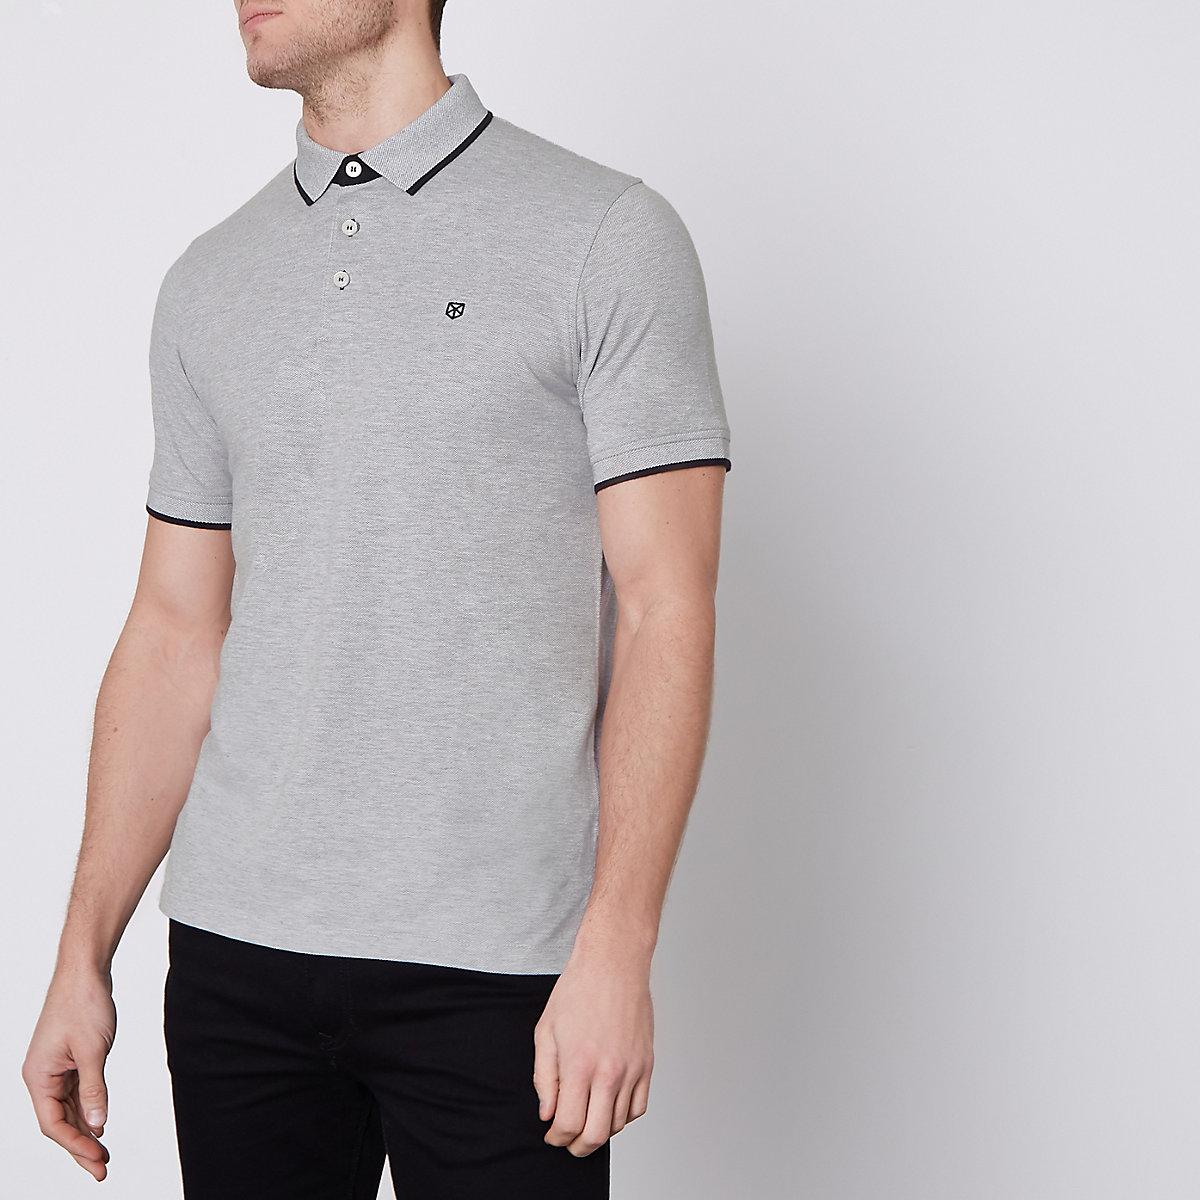 Jack & Jones Premium grey tipped polo shirt